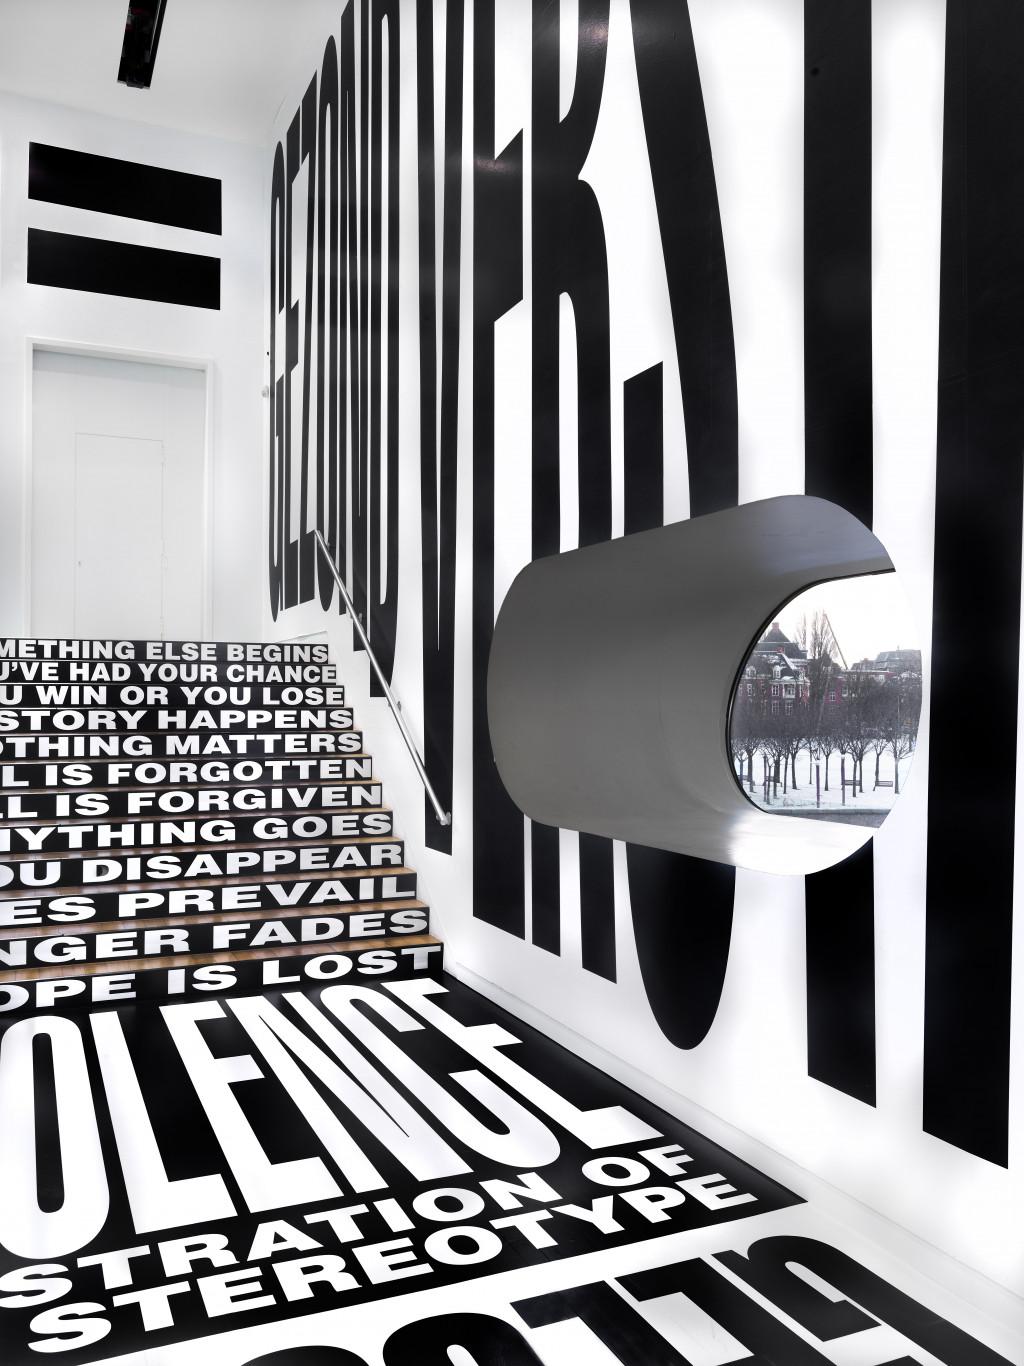 Barbara Kruger, installation view The collection, STEDELIJK BASE. Photo: Gert Jan van Rooij